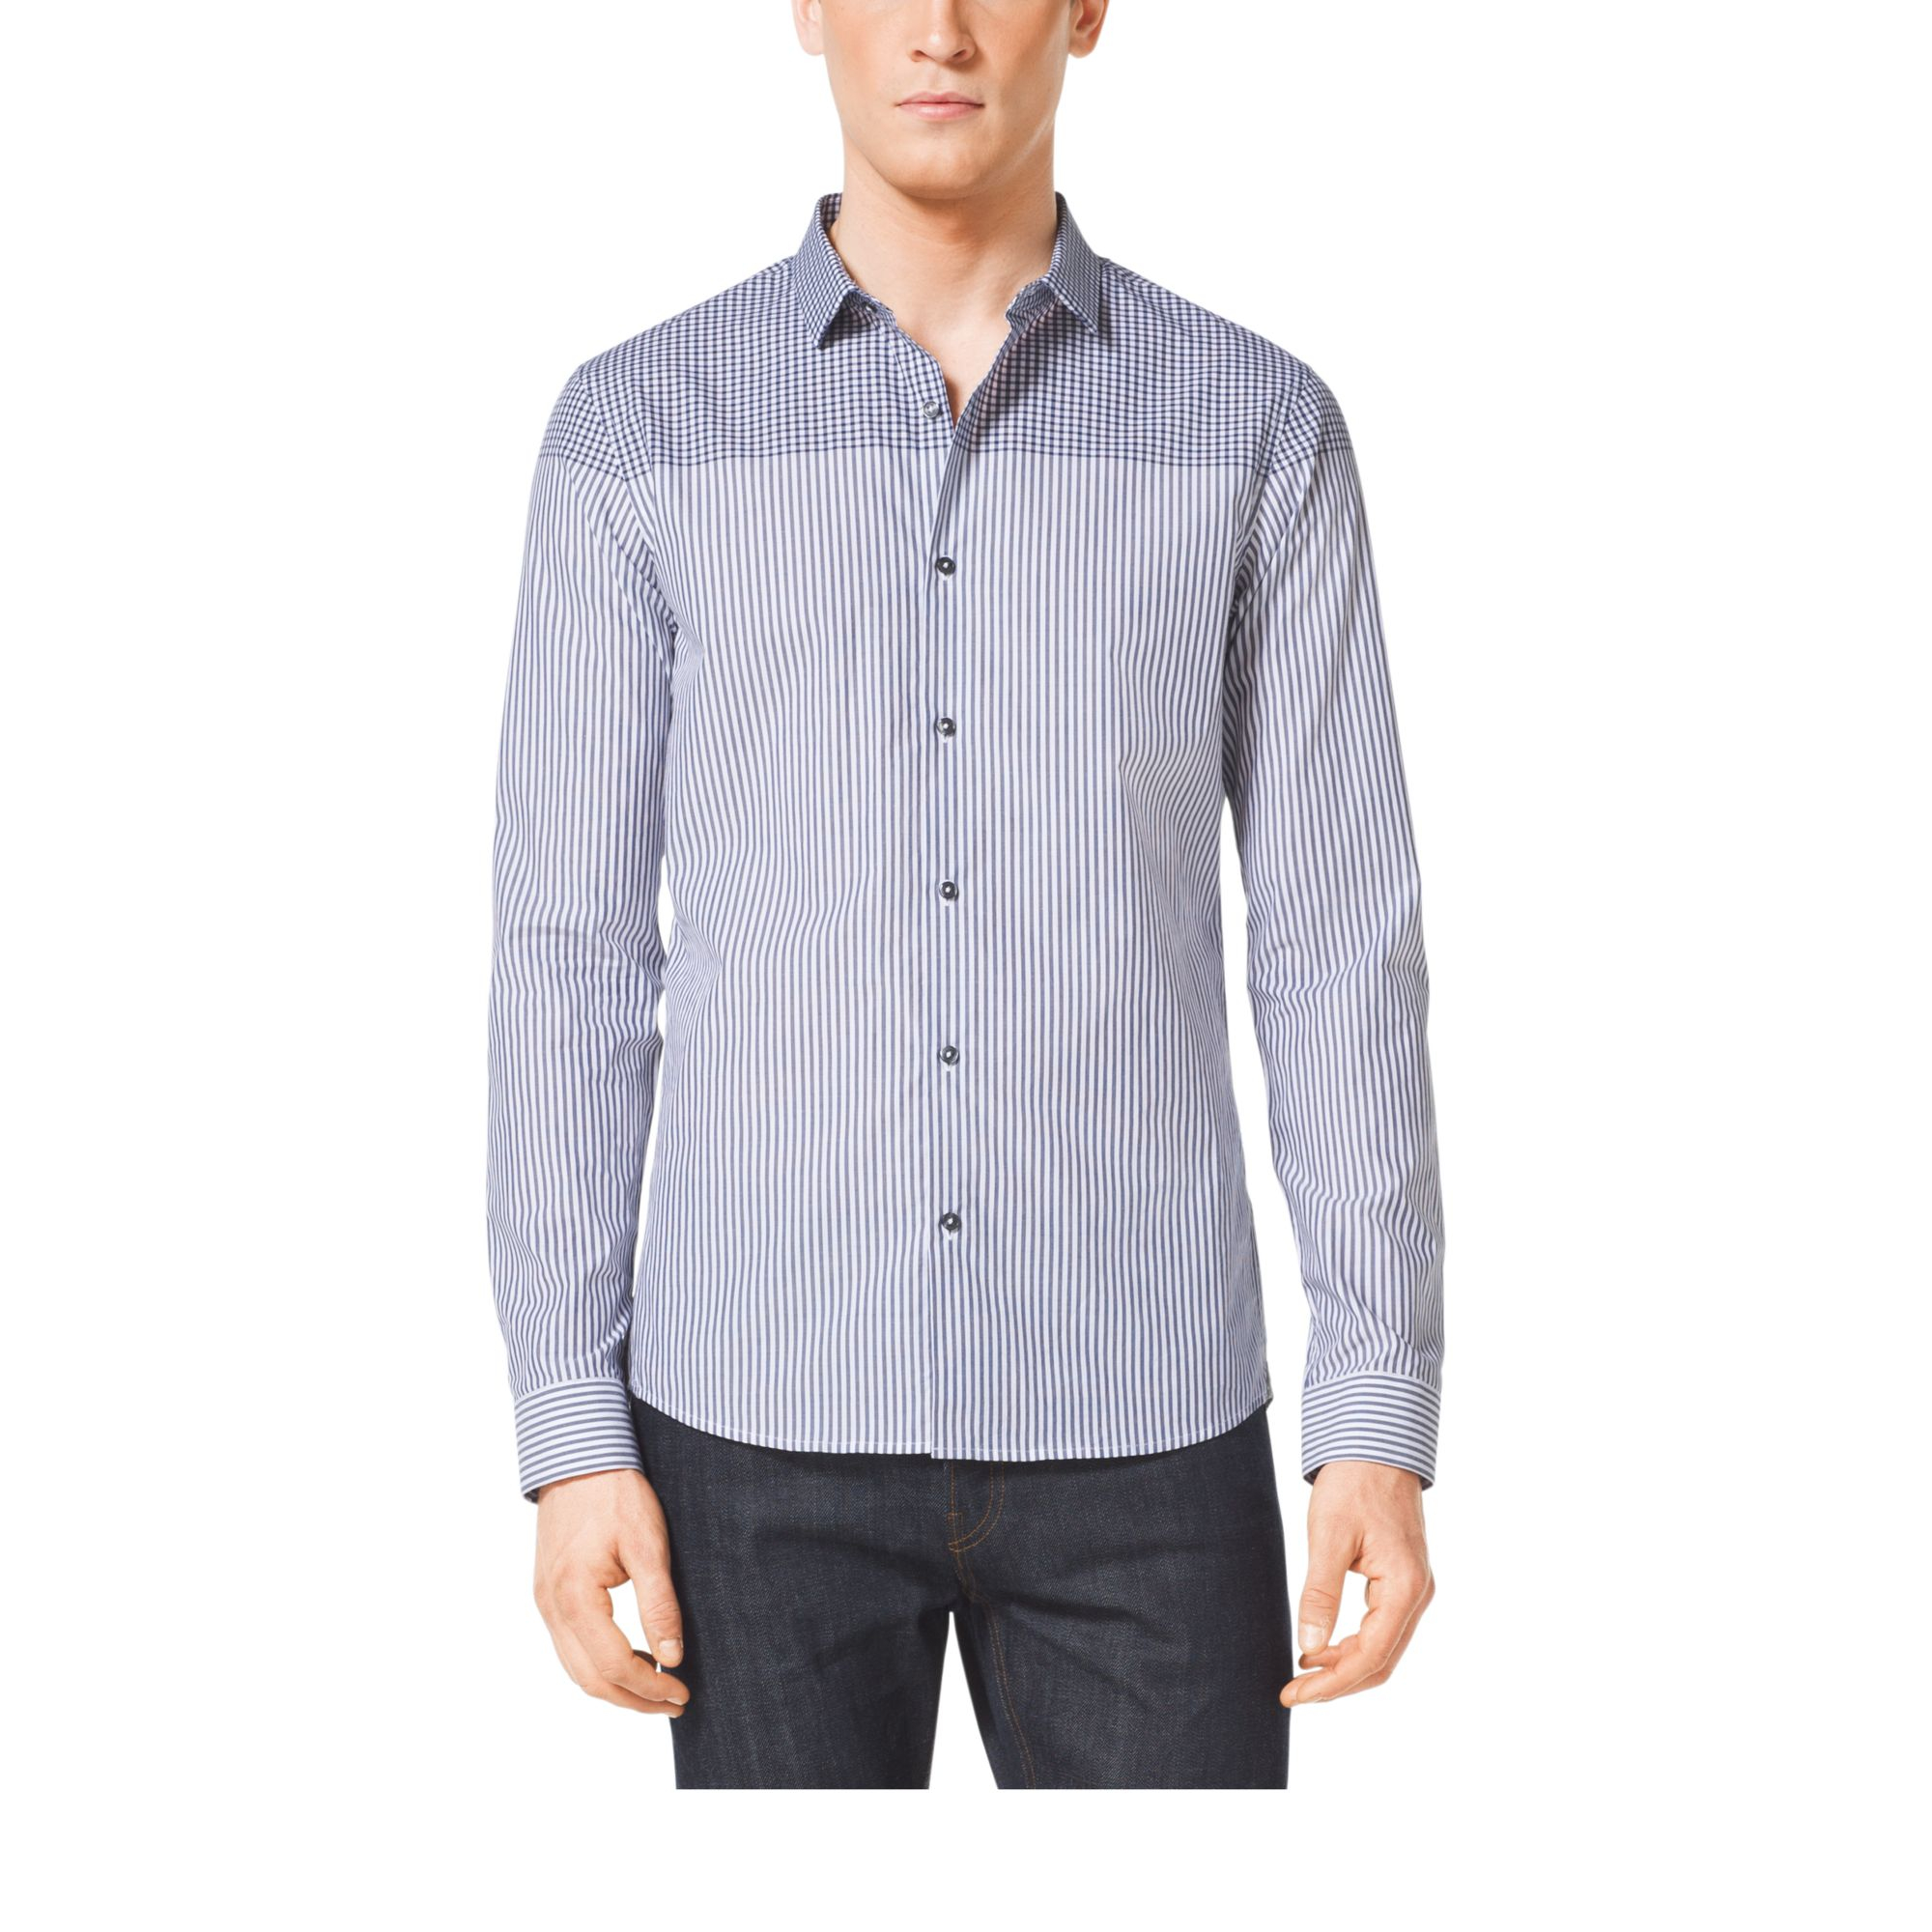 Michael kors slim fit check cotton shirt in blue for men for Slim fit cotton shirts